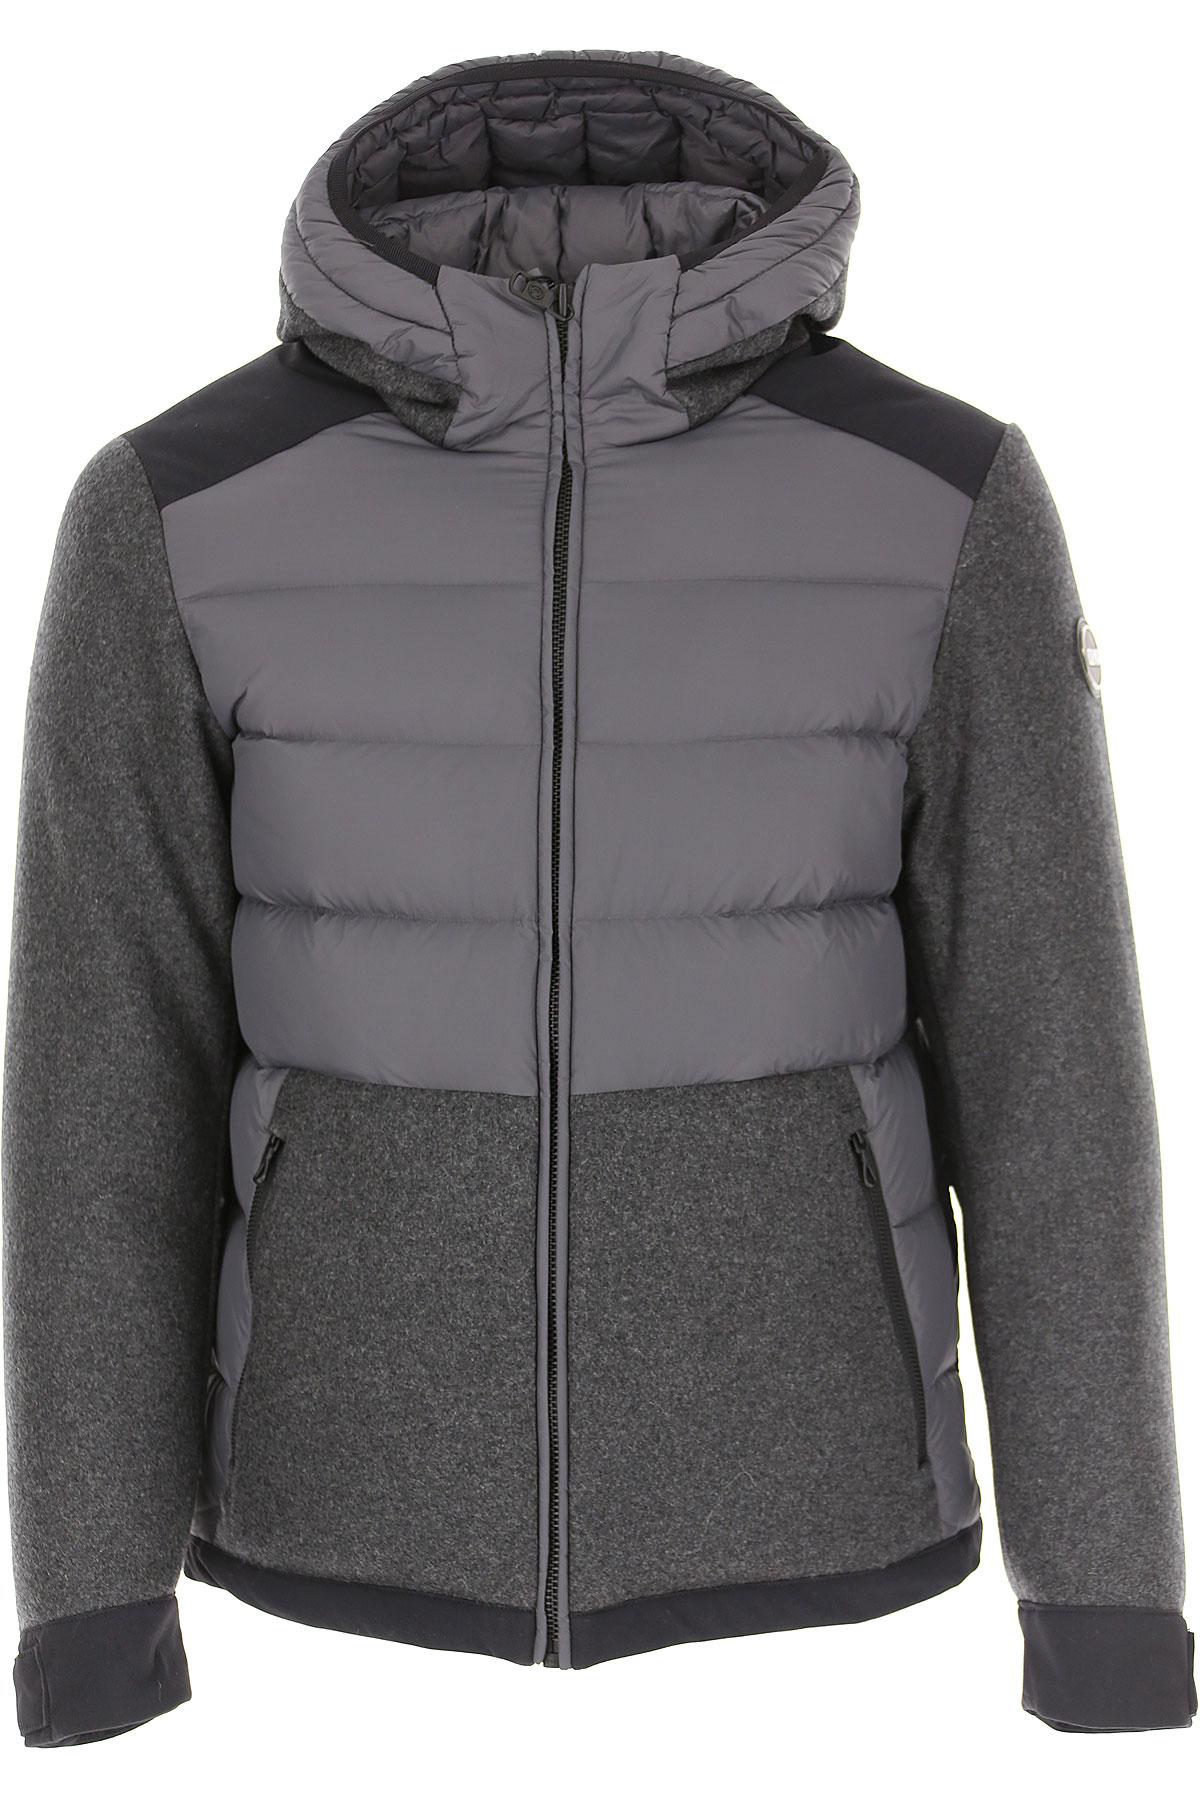 Colmar Down Jacket for Men, Puffer Ski Jacket On Sale, Medium Grey, polyester, 2019, L M S XL XXL